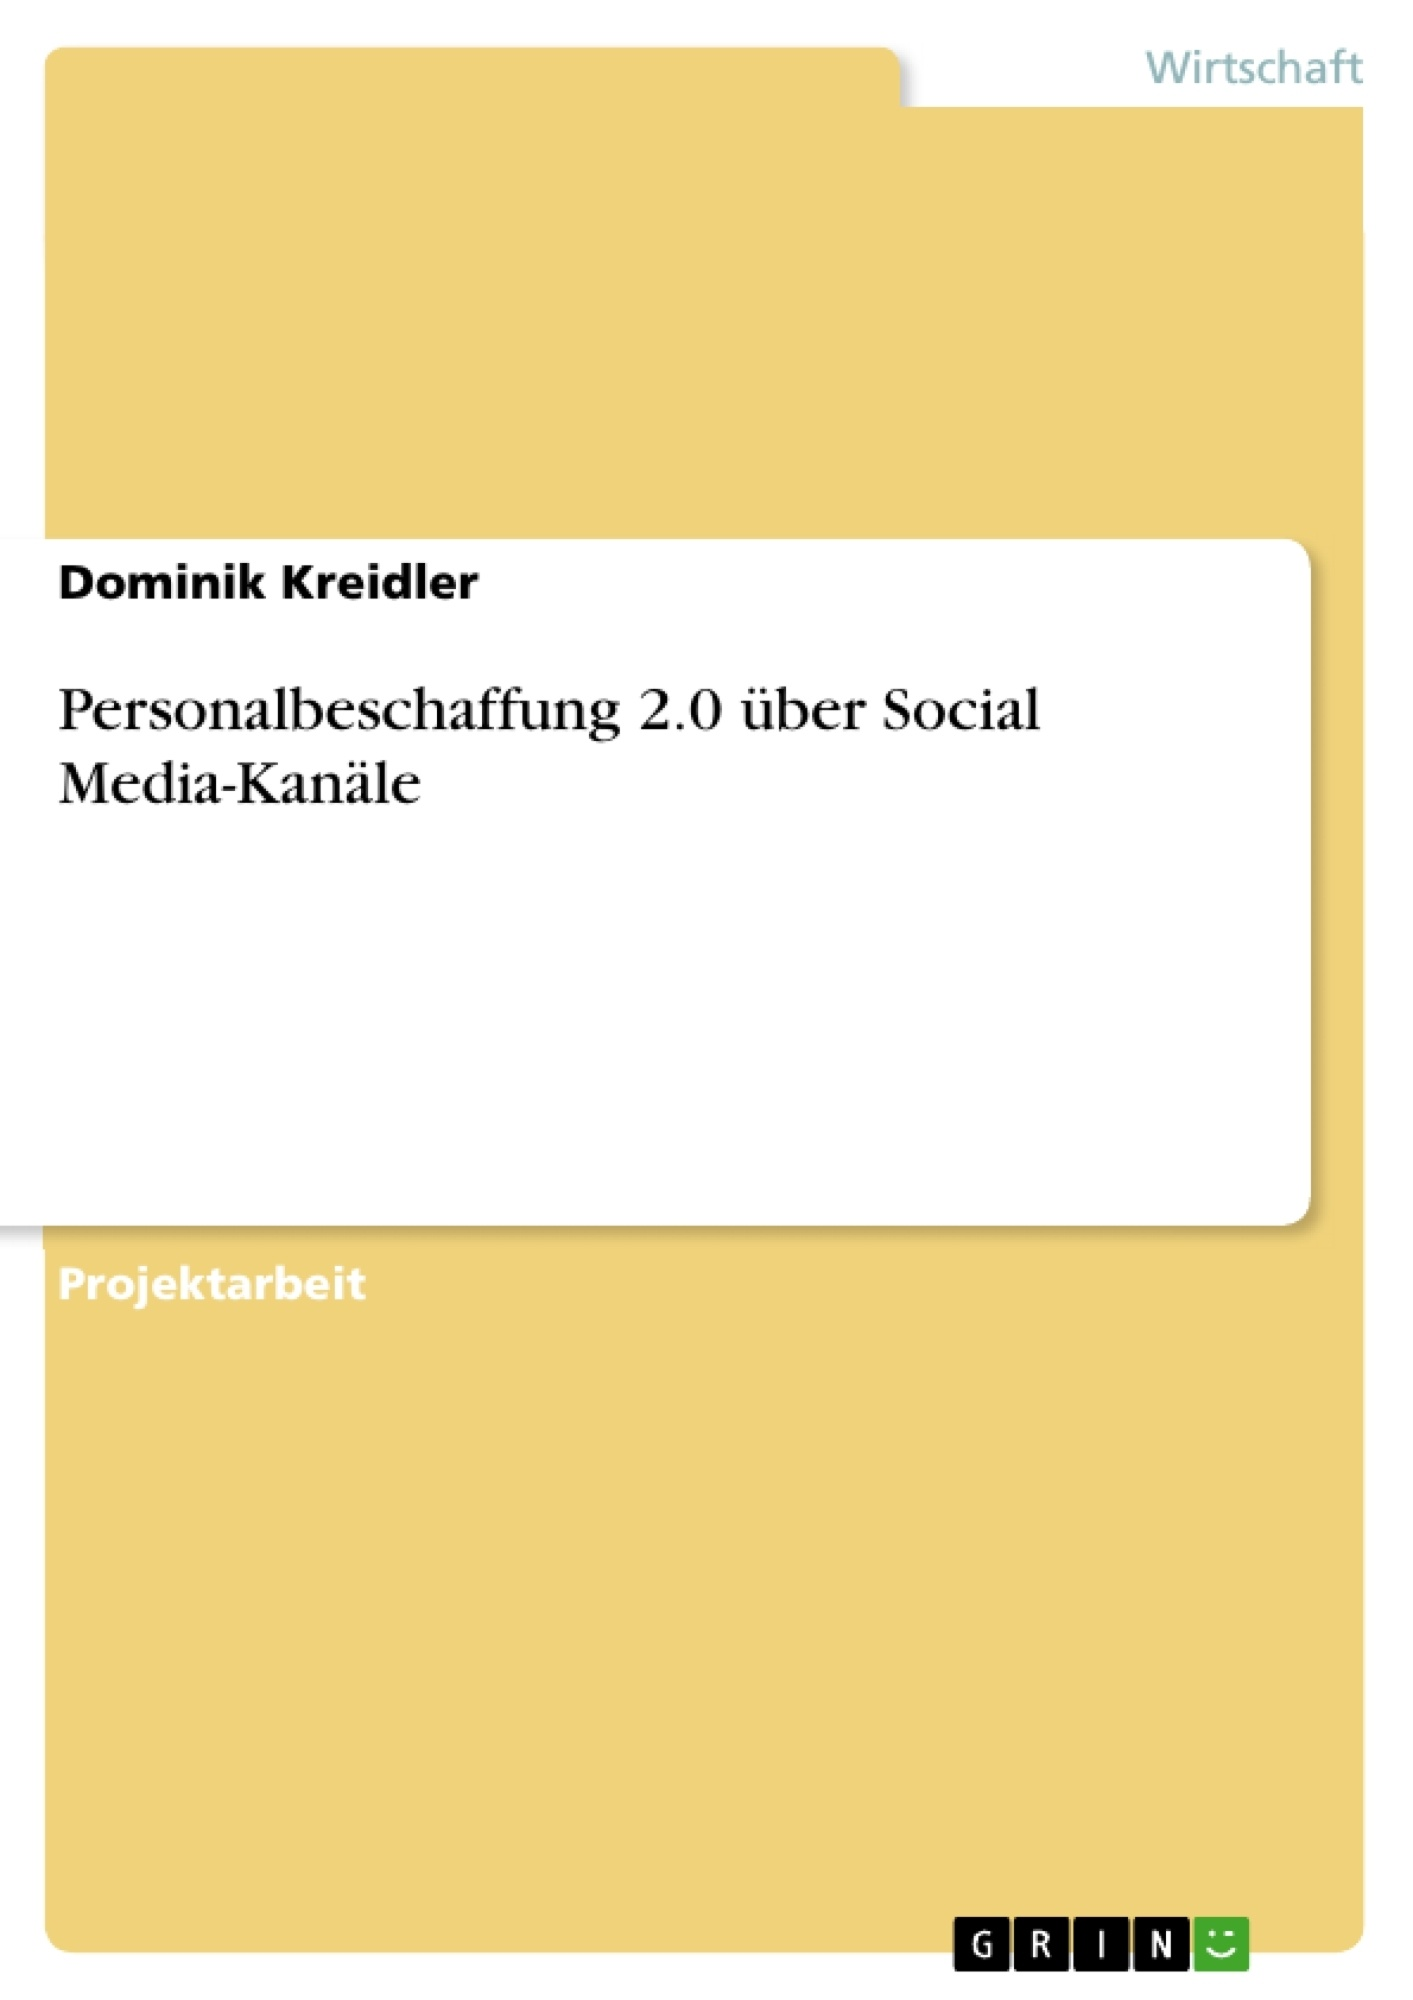 Titel: Personalbeschaffung 2.0 über Social Media-Kanäle